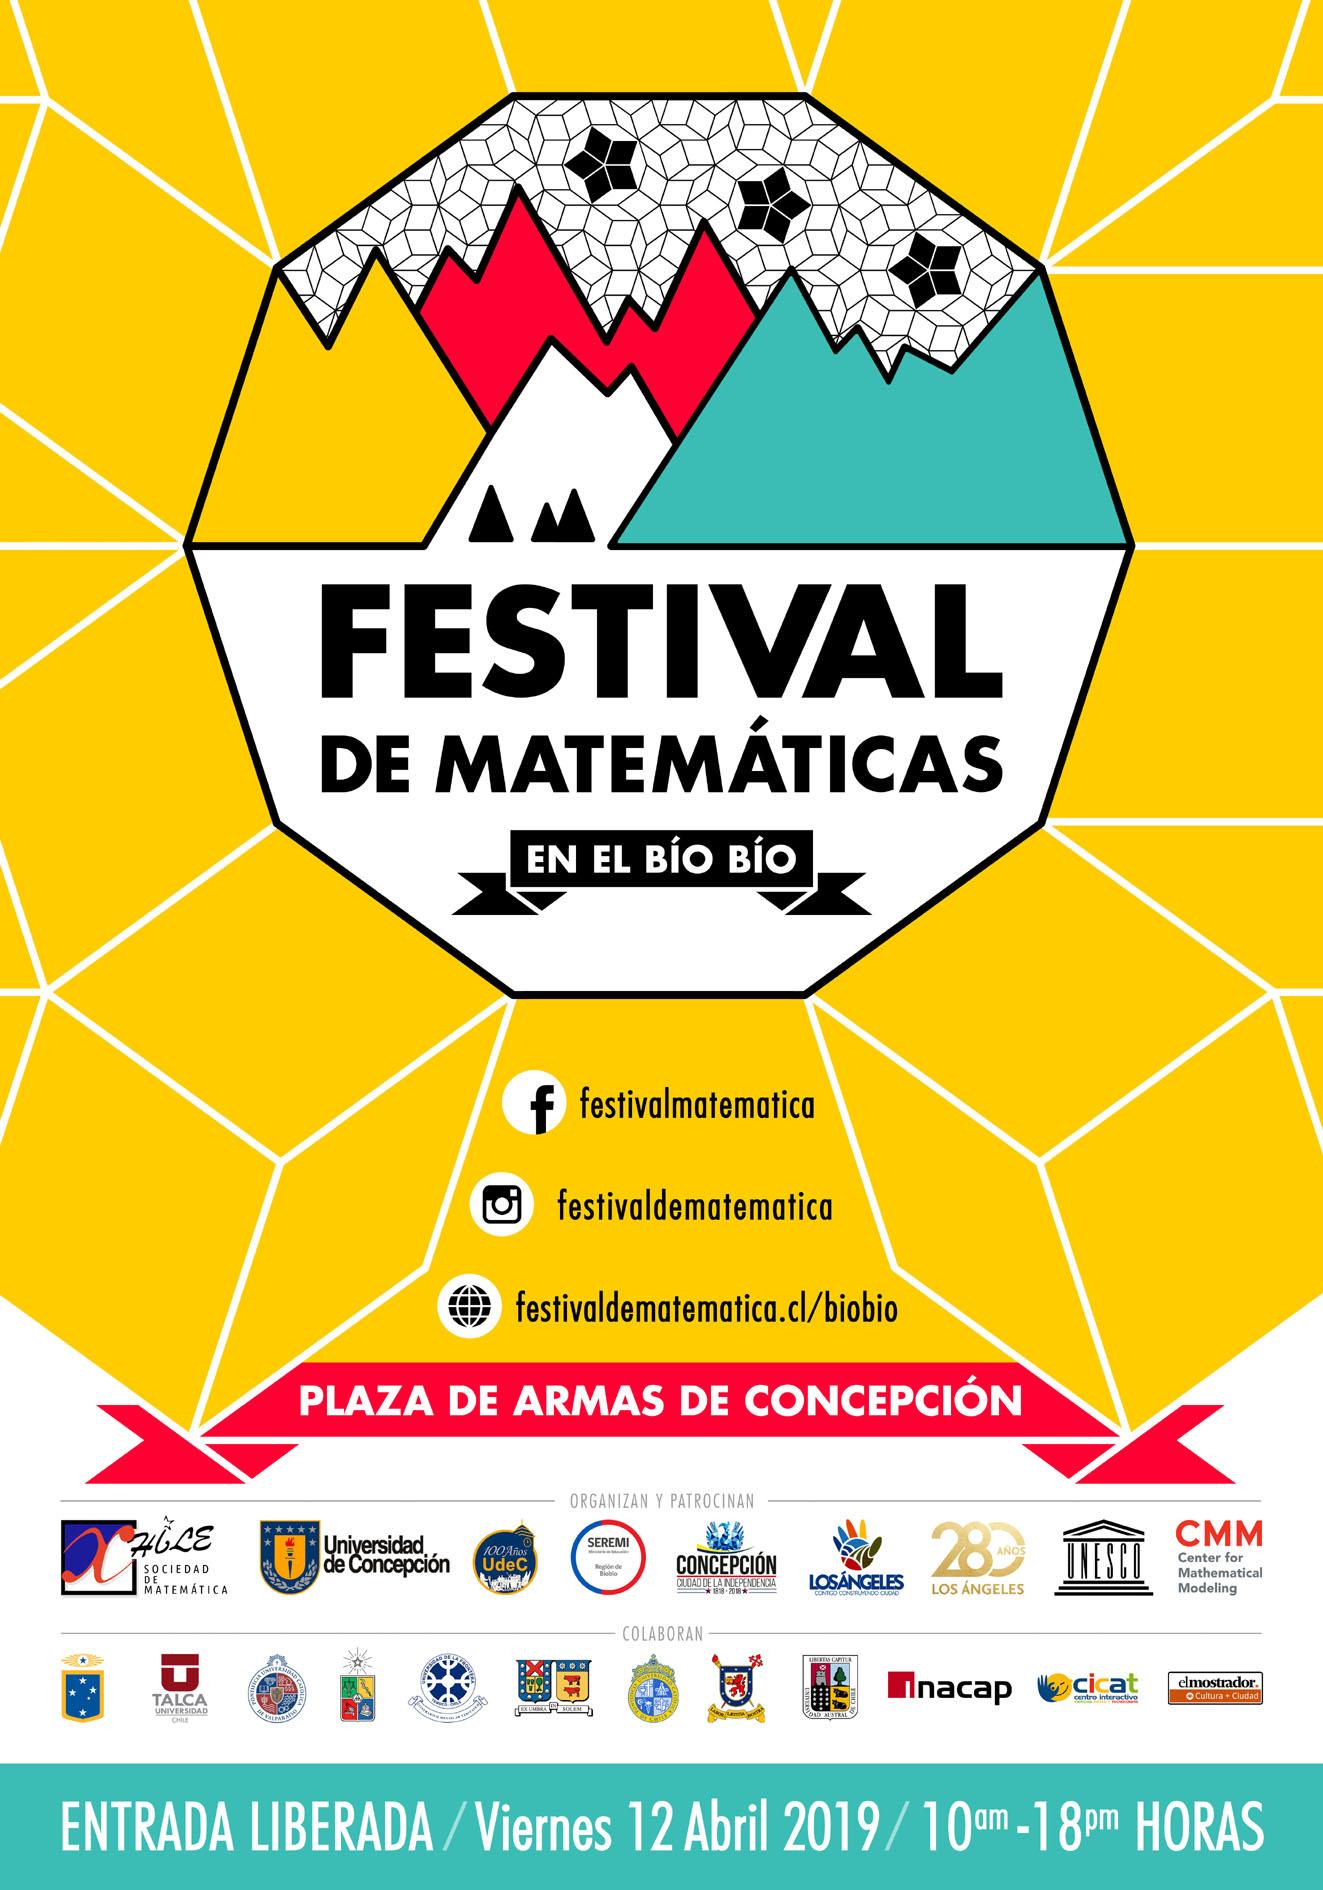 afichefestivalMAT_concepcion.jpg